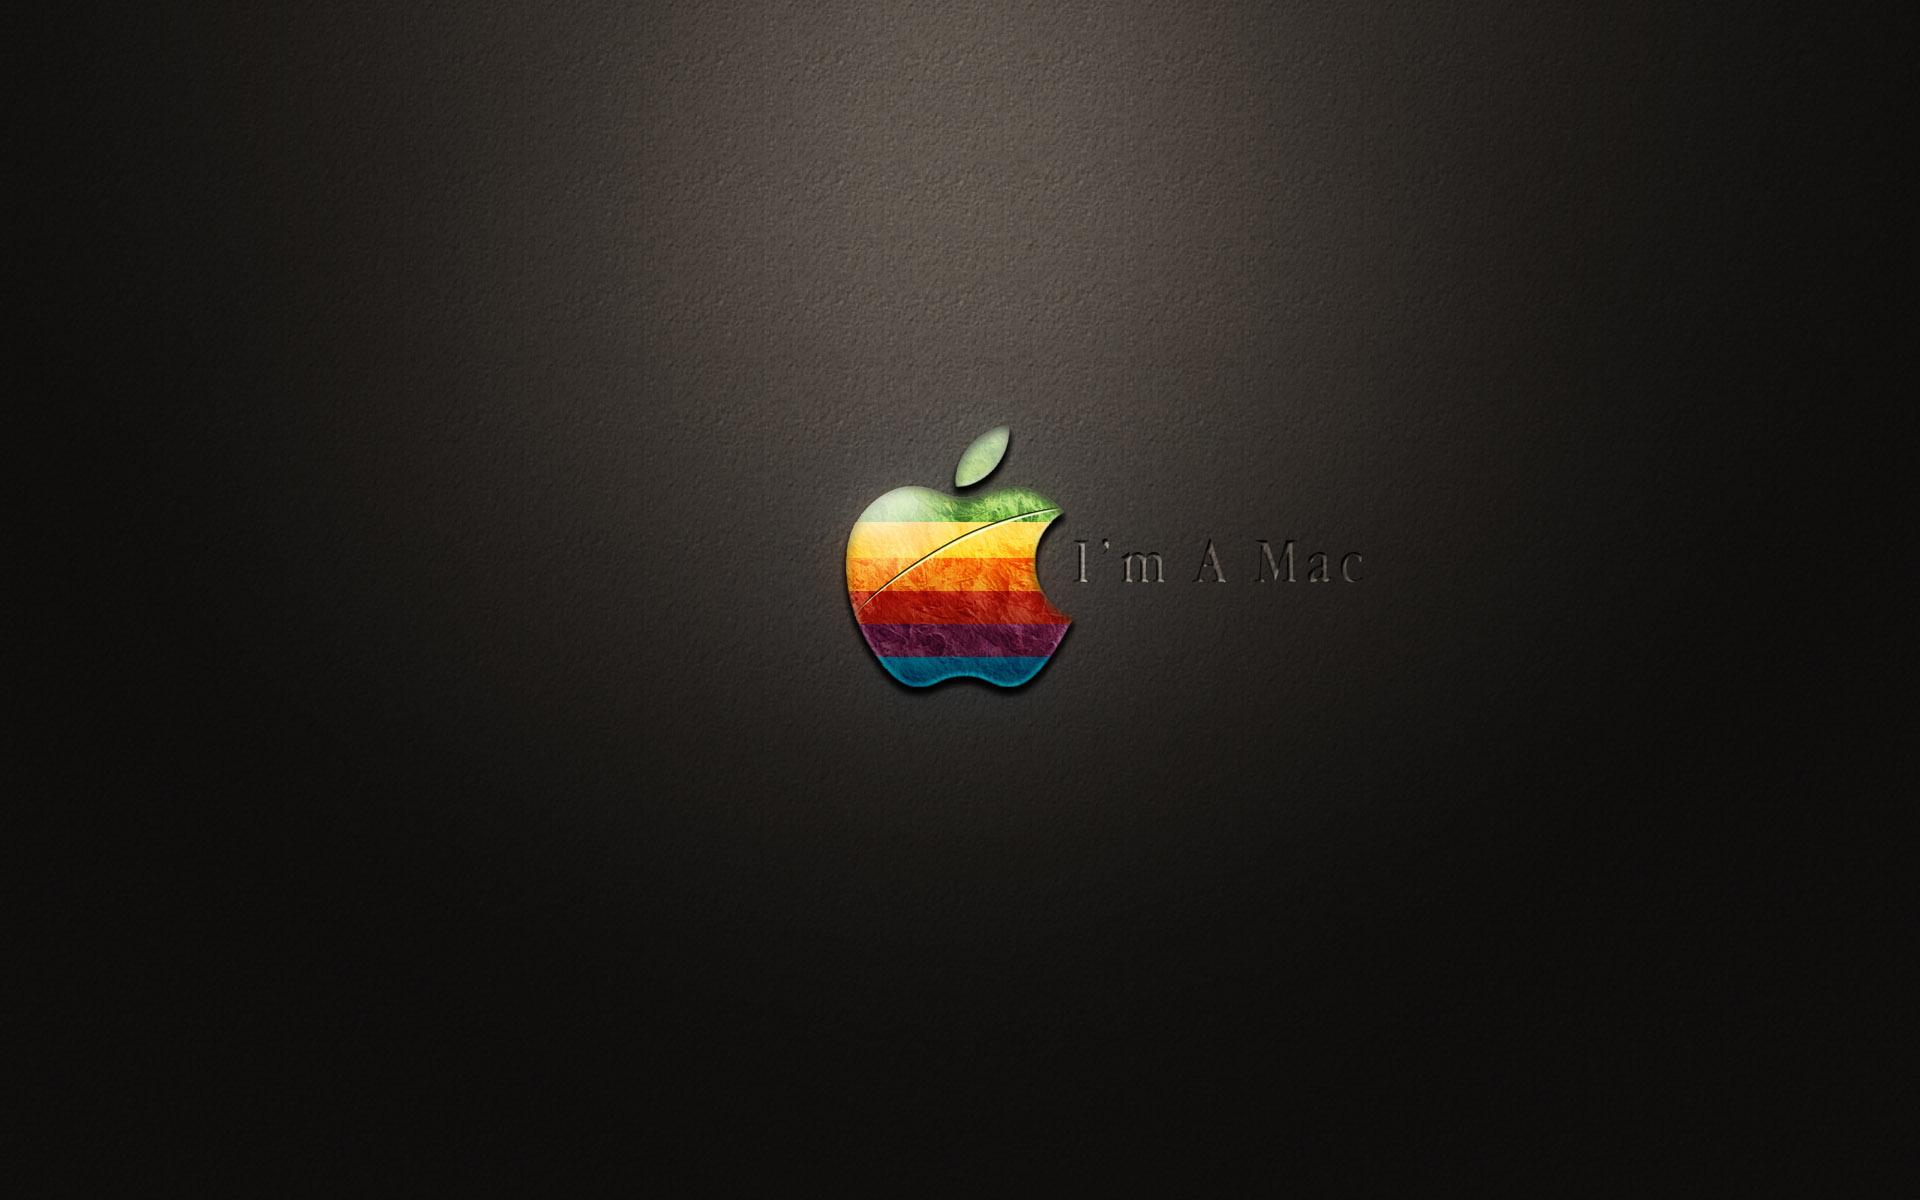 Apple Hd Wallpapers For Mac wallpaper   459793 1920x1200